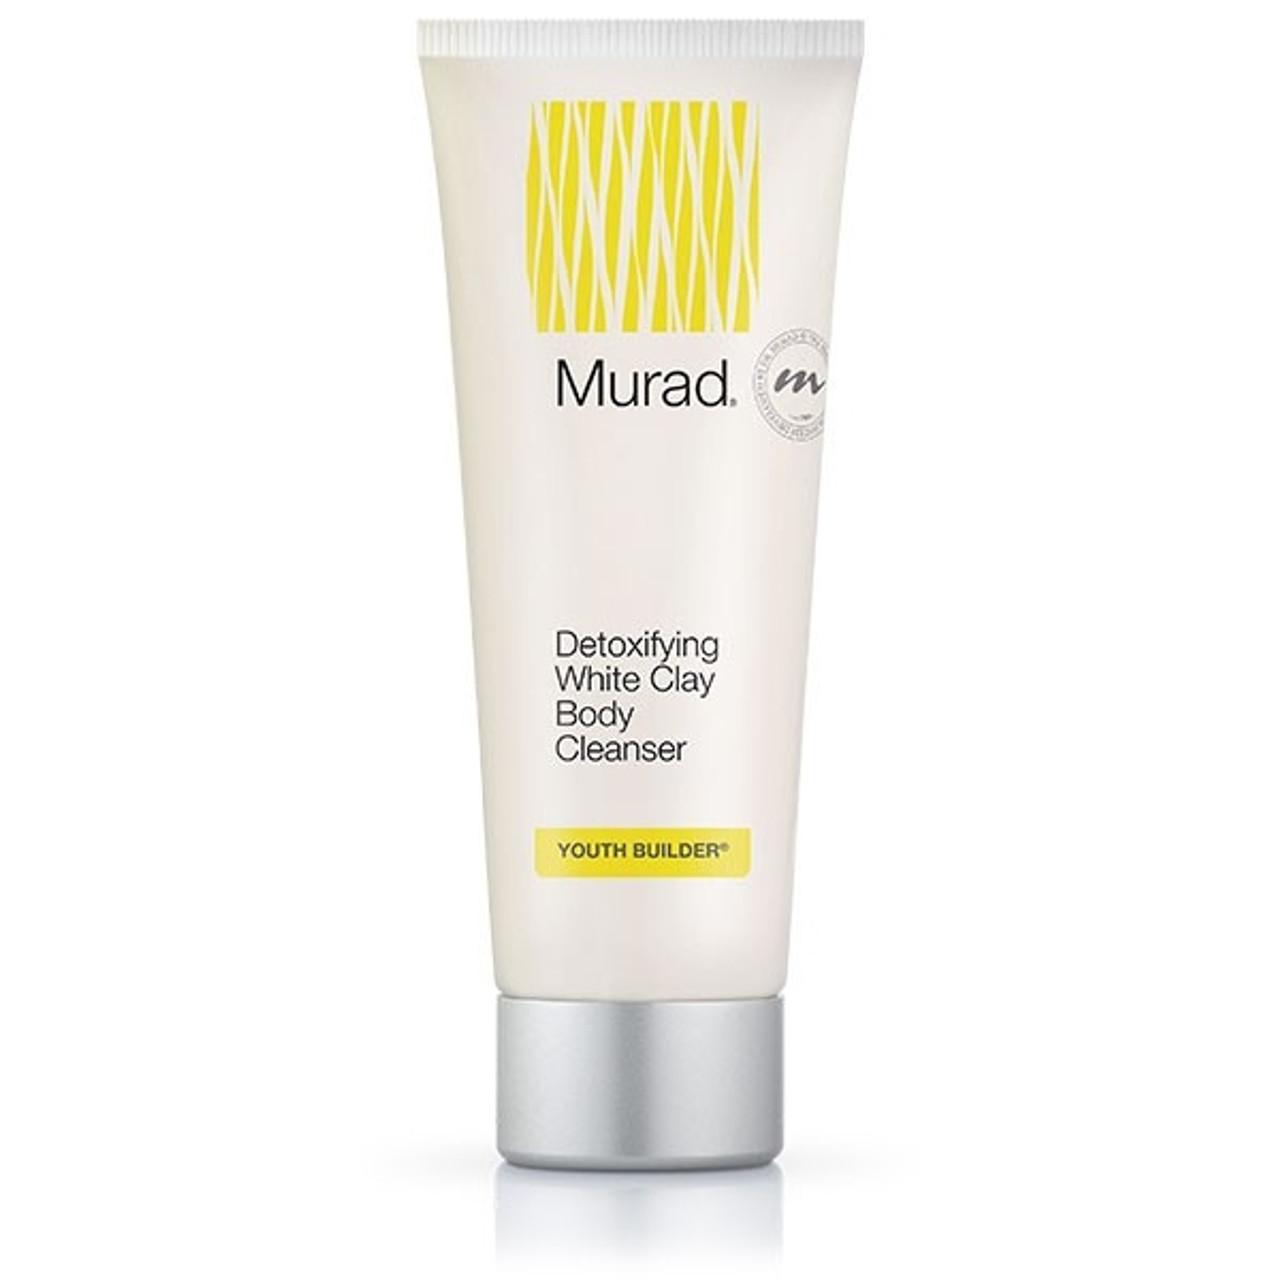 Murad Detoxifying White Clay Body Cleanser 2 oz